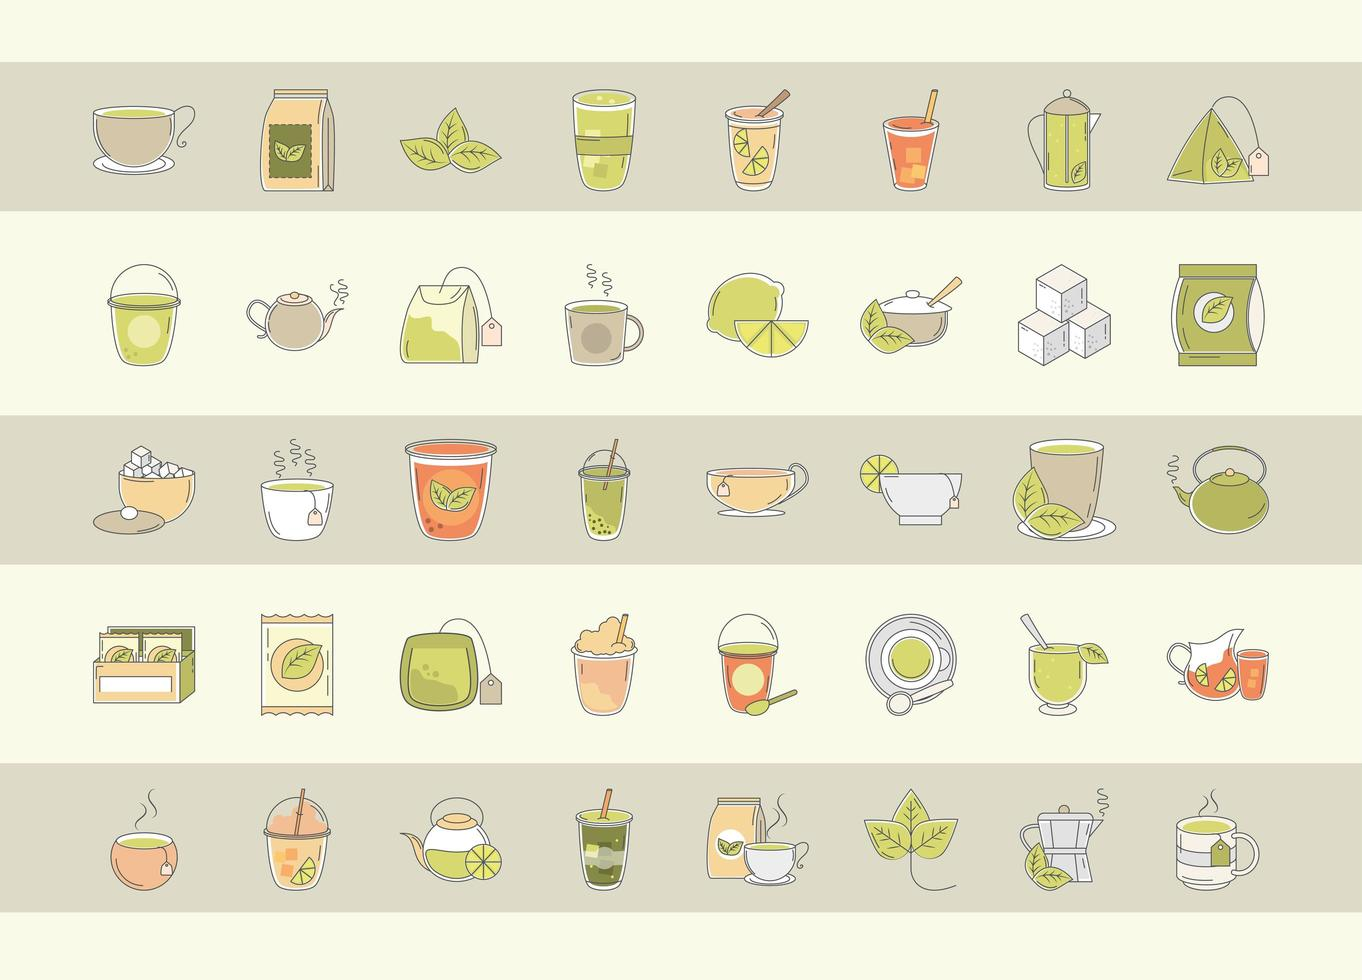 jeu d'icônes de l'heure du thé vecteur